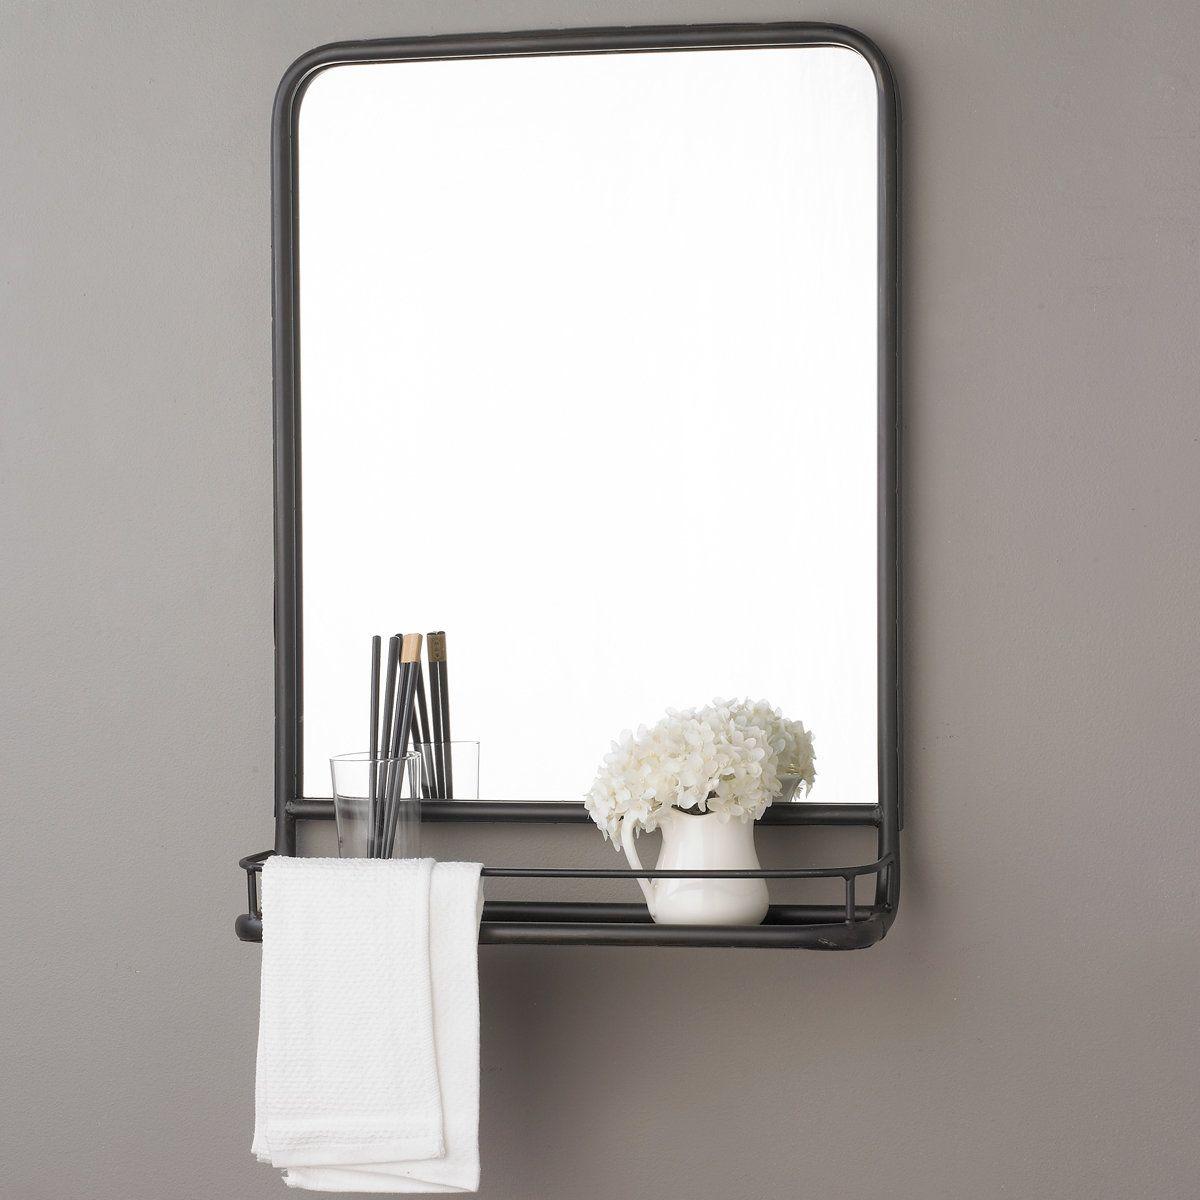 Bronze Bathroom Mirror With Shelf Bathroom Mirror With Shelf Mirror With Shelf Bathroom Mirrors Diy [ 1200 x 1200 Pixel ]